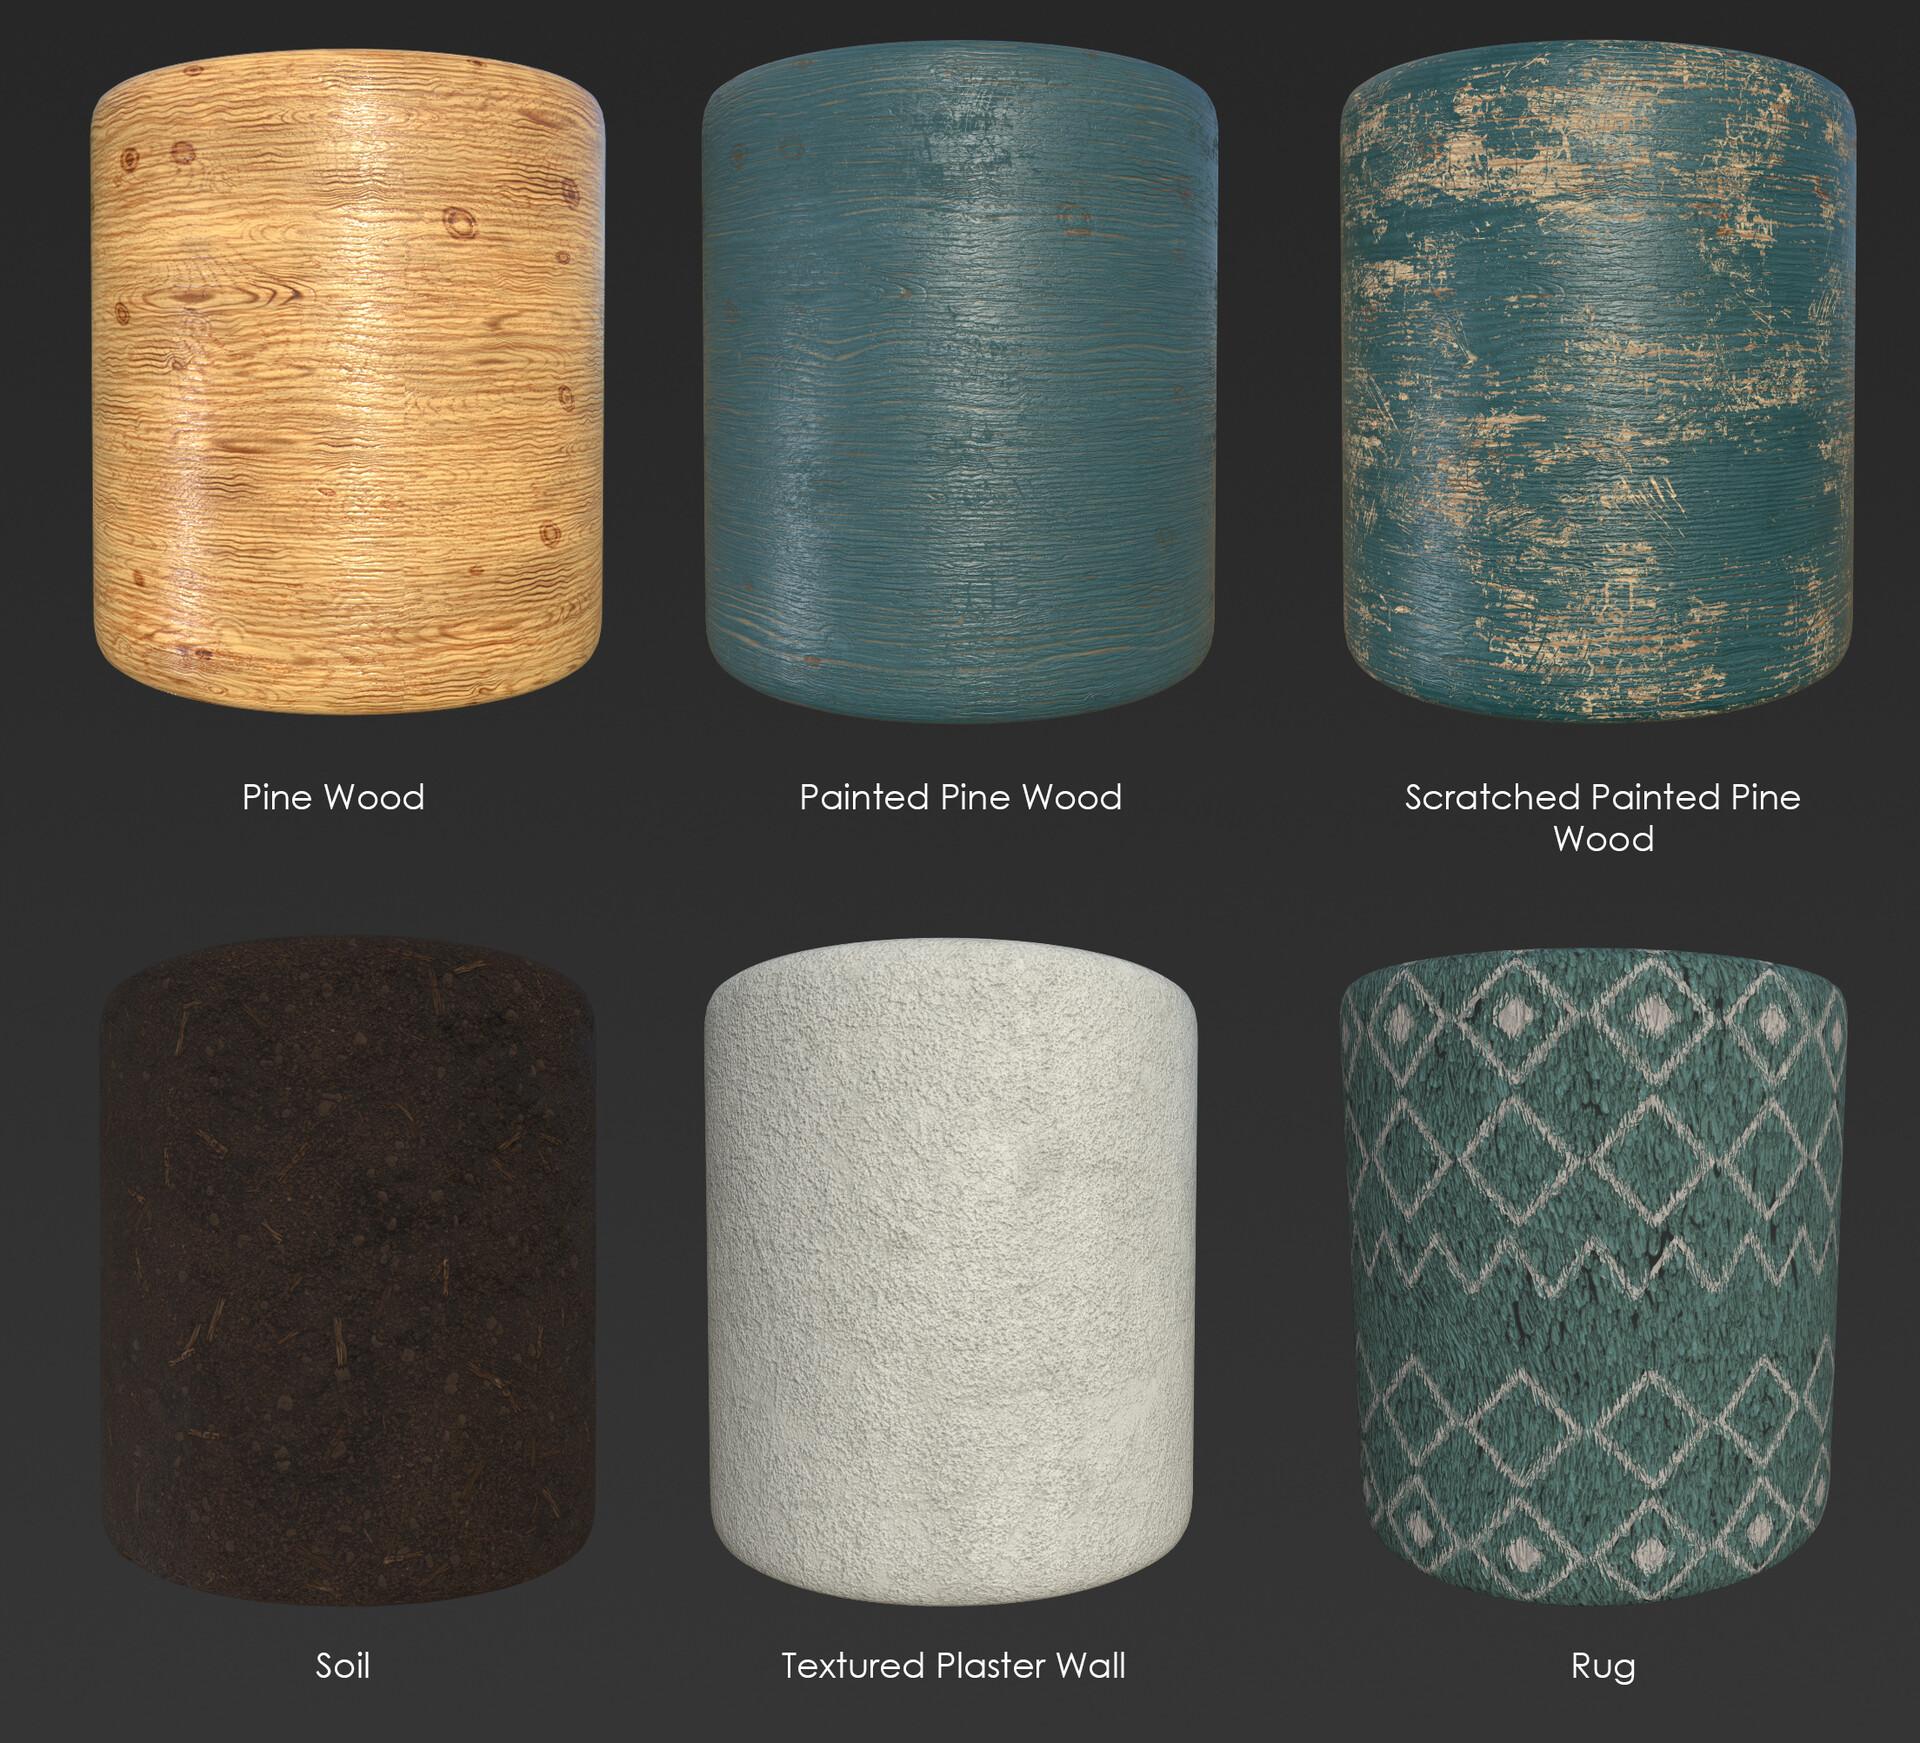 Litha bacchi materials